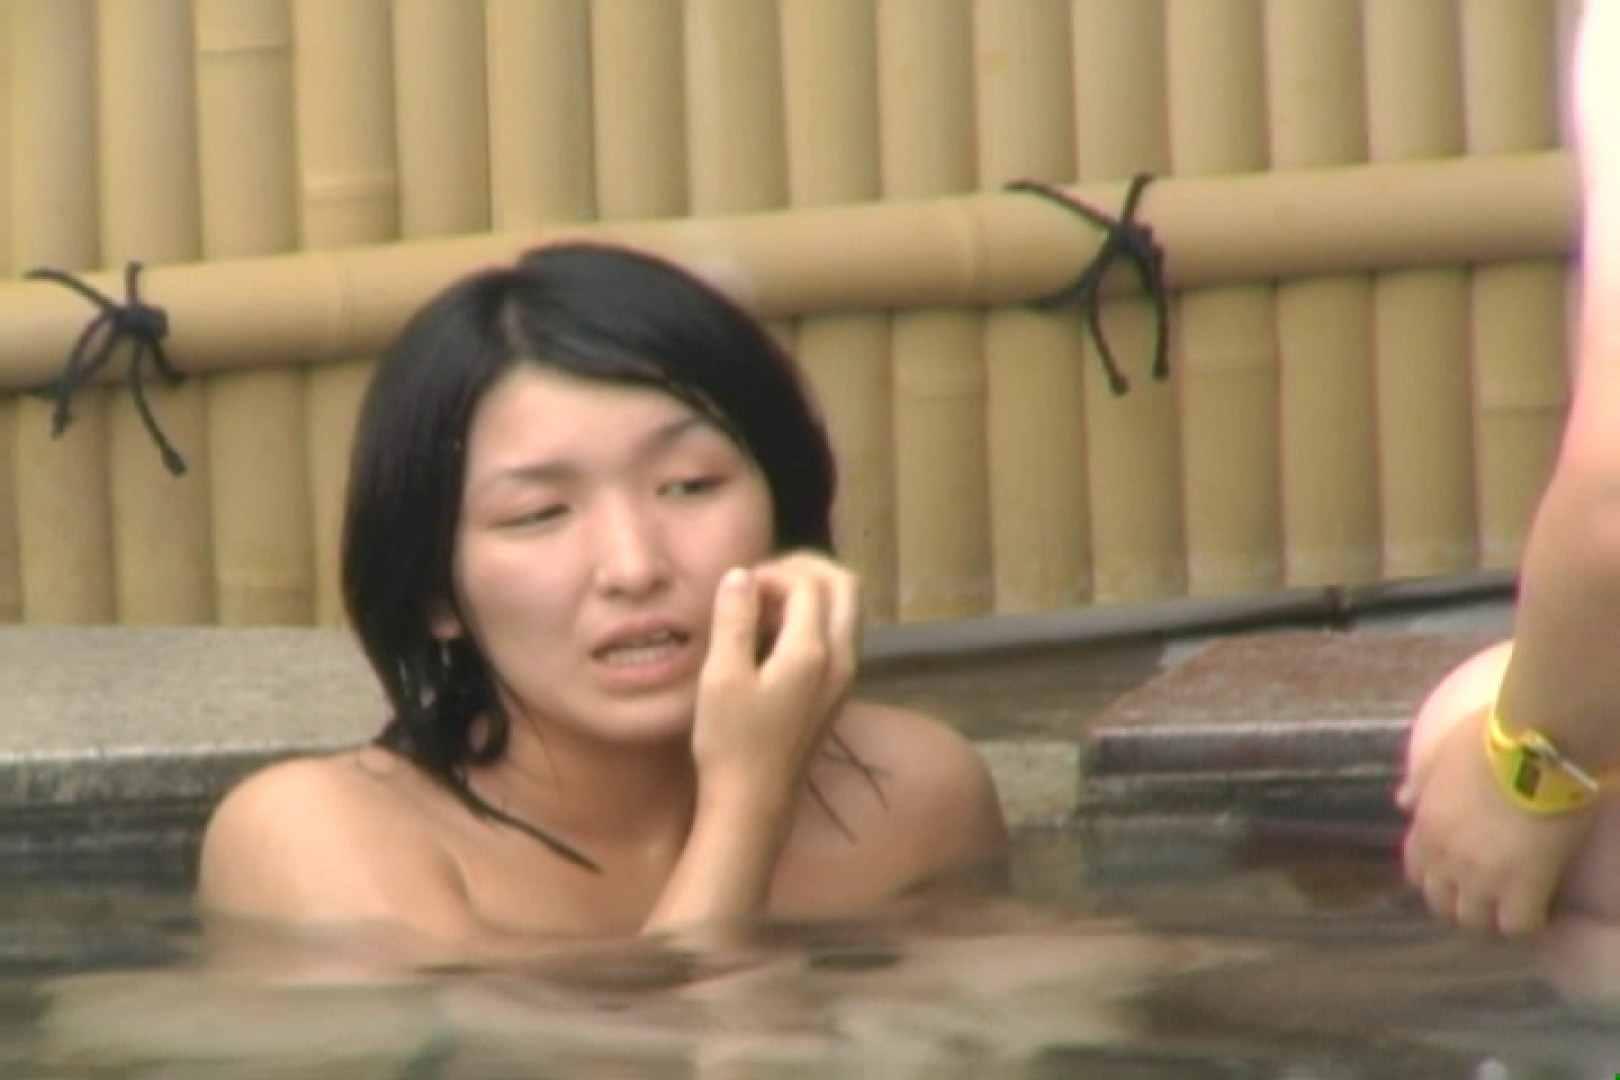 Aquaな露天風呂Vol.618 露天風呂 エロ画像 67連発 56